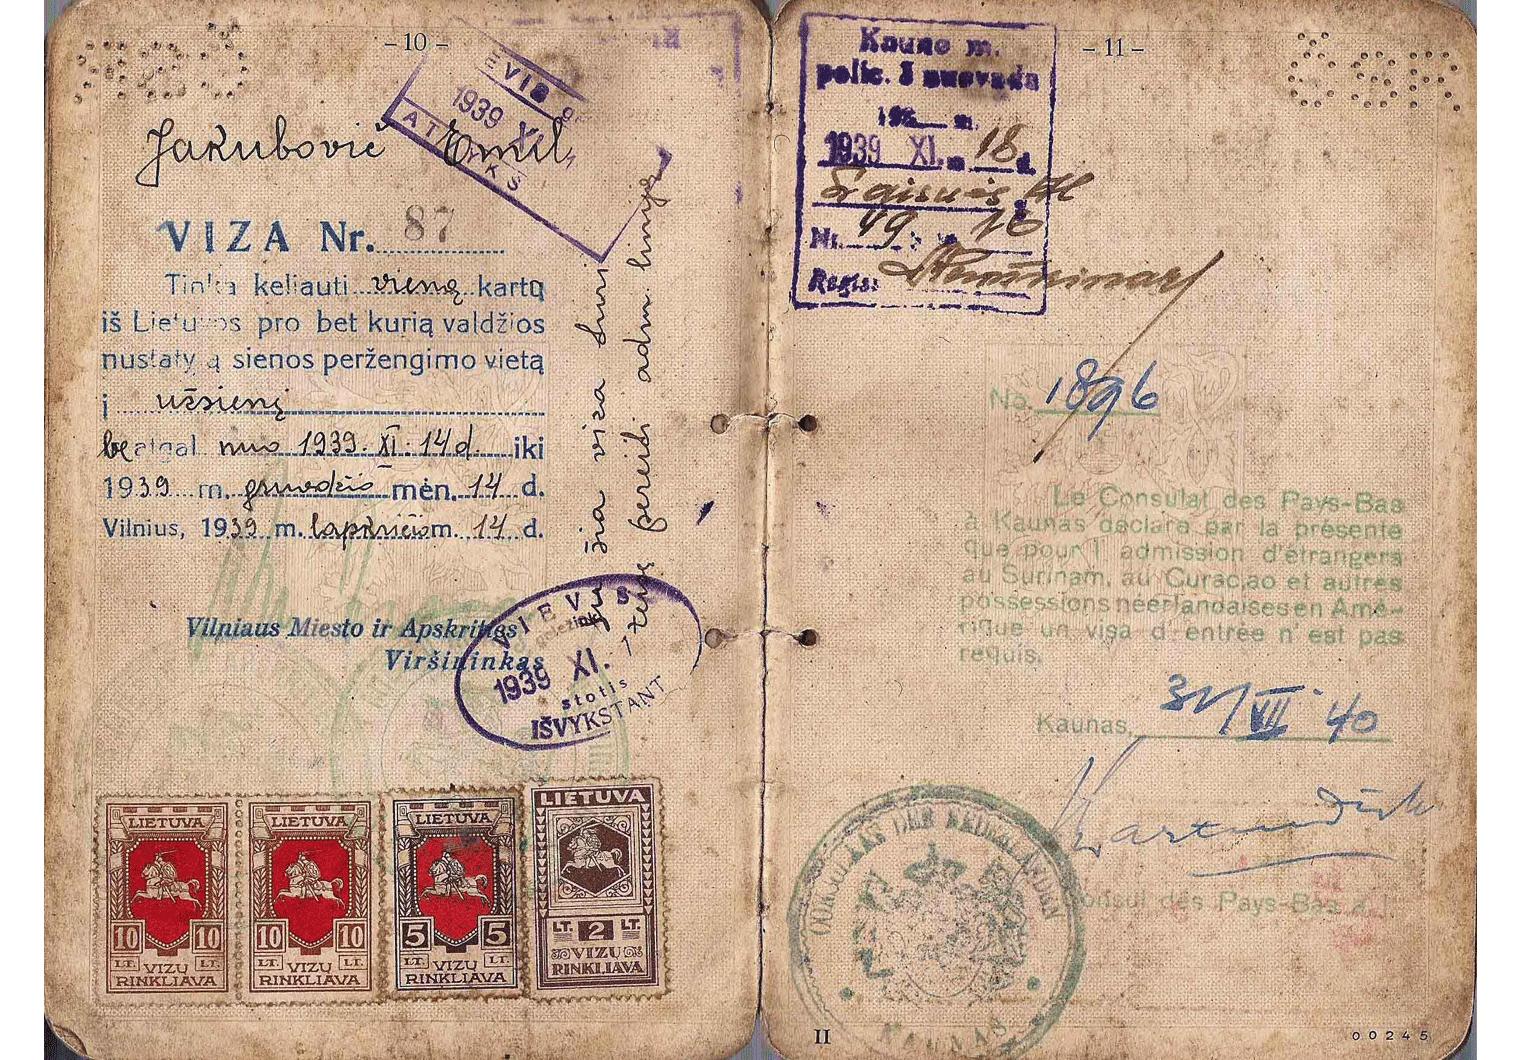 Jan Zwartendijk life-saving visa